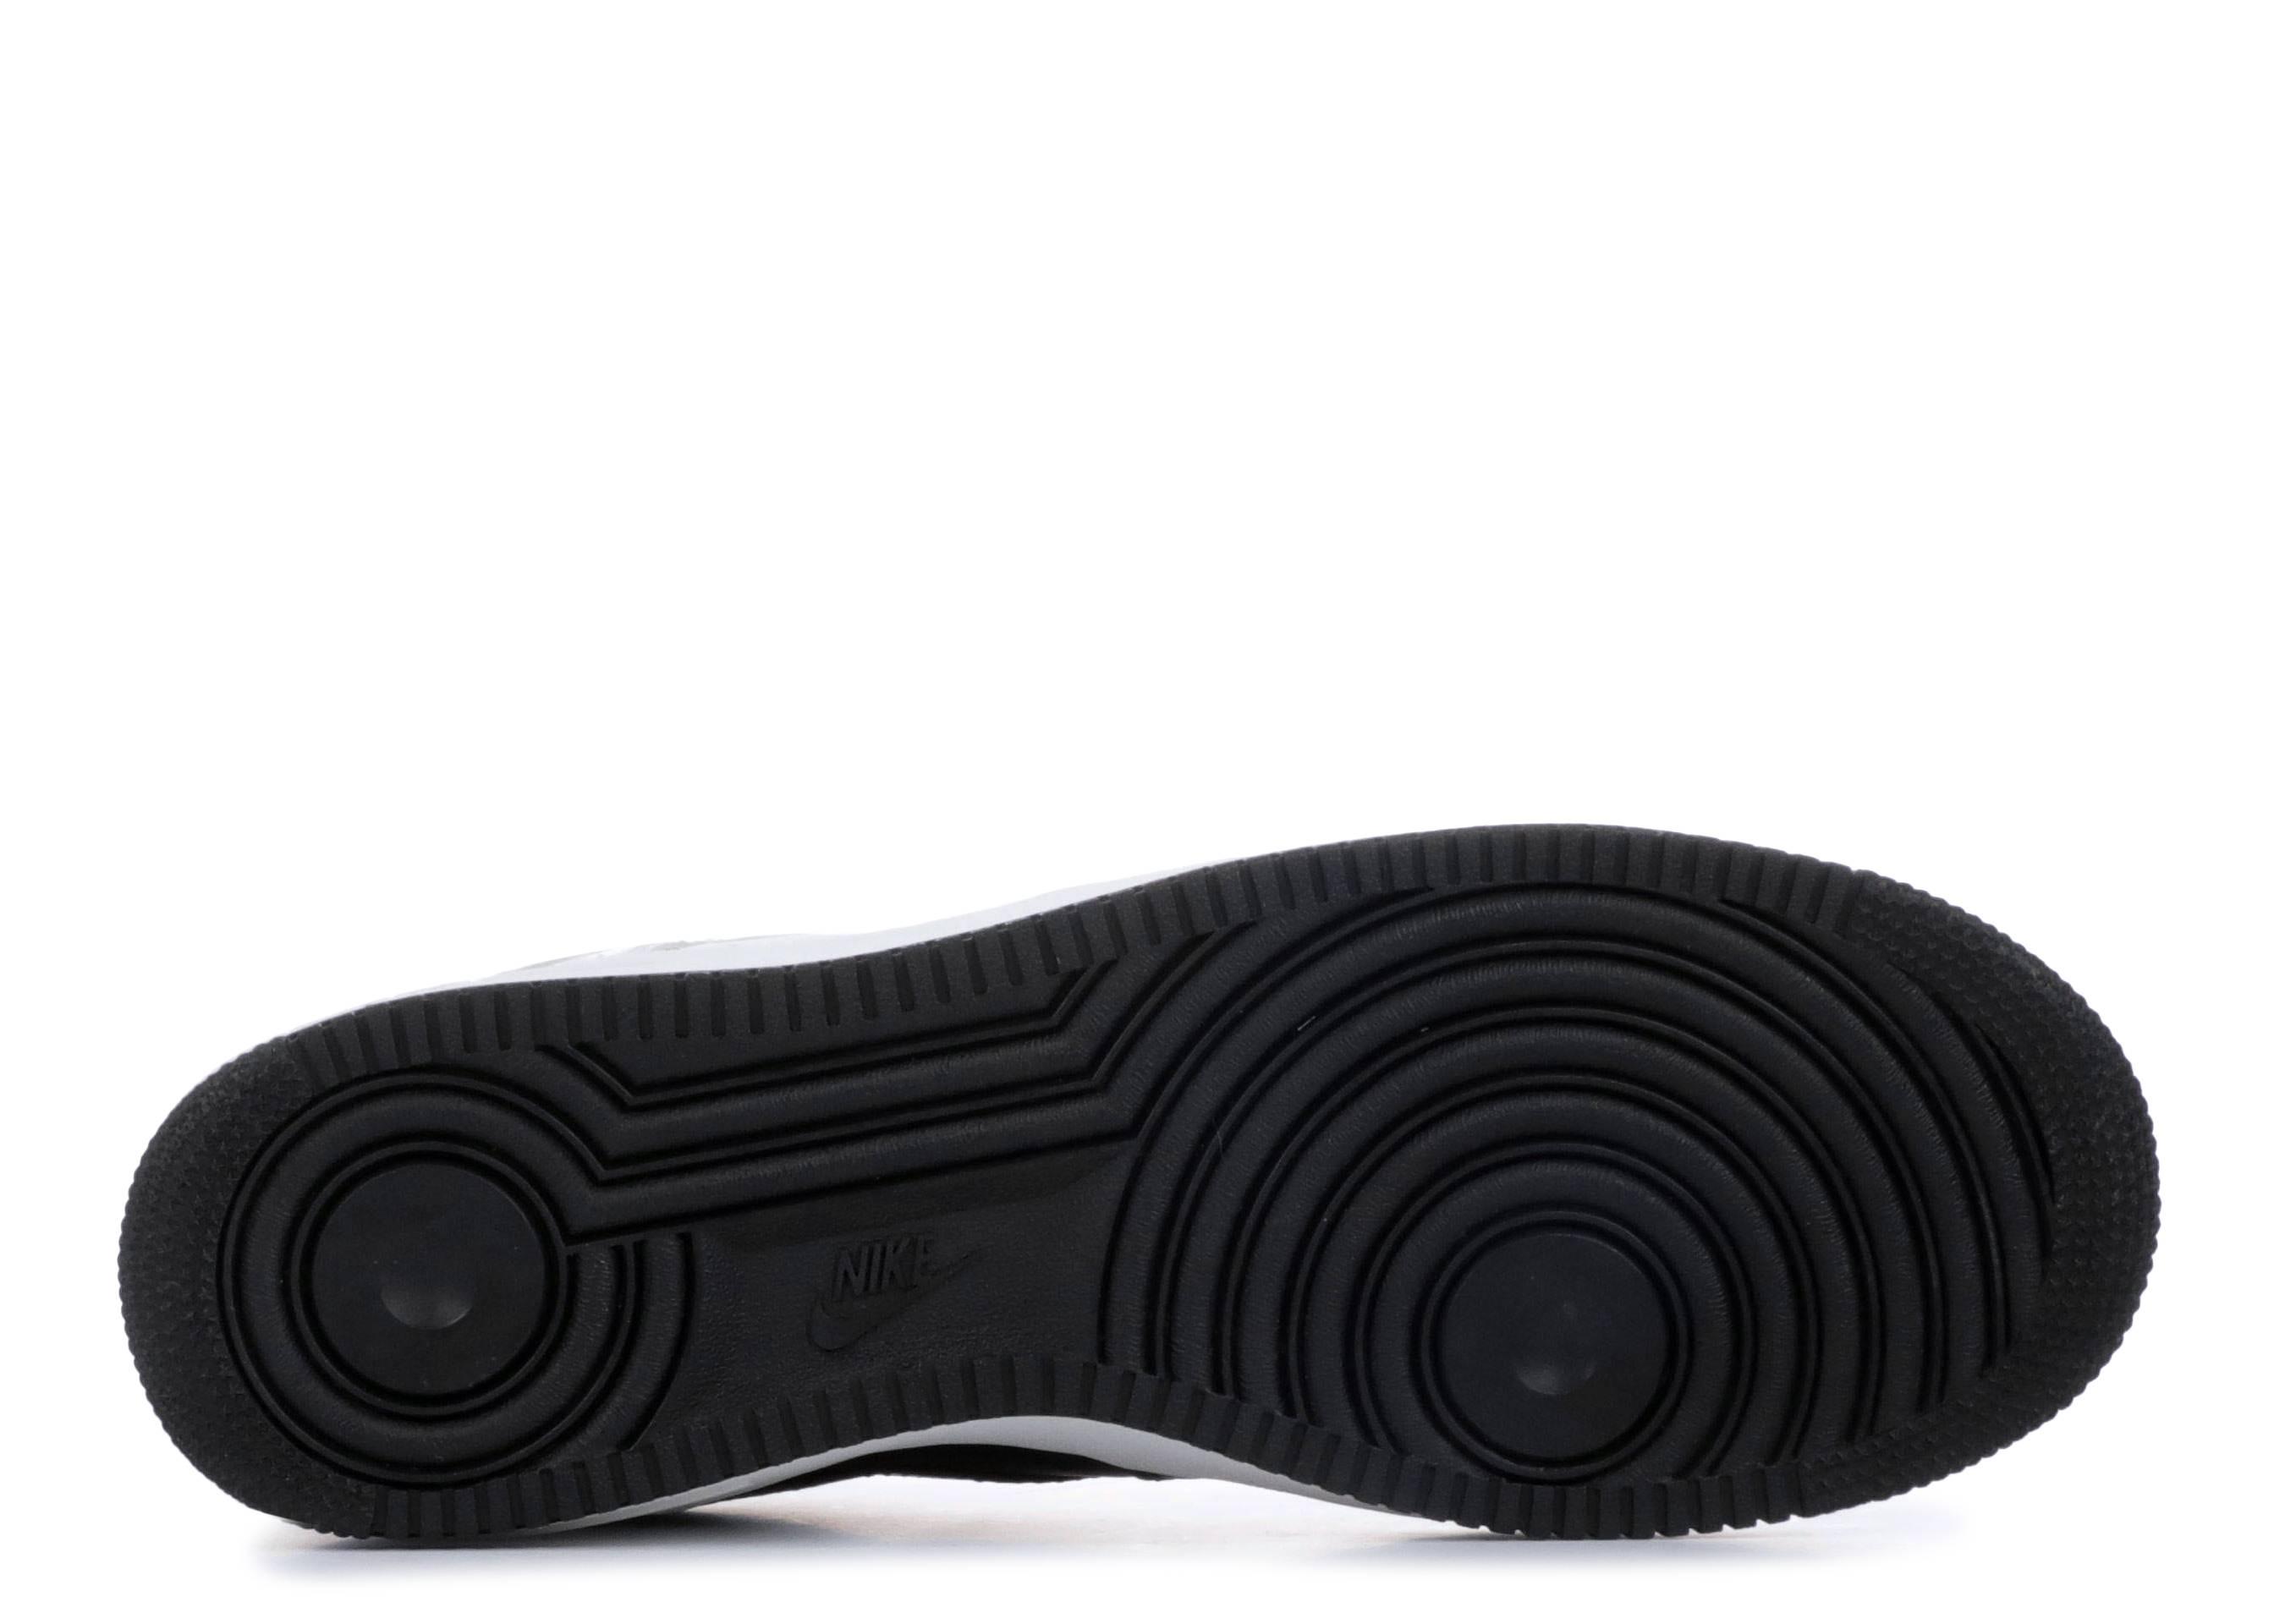 Air Force 1 Premium scarface Nike 313641 101 white